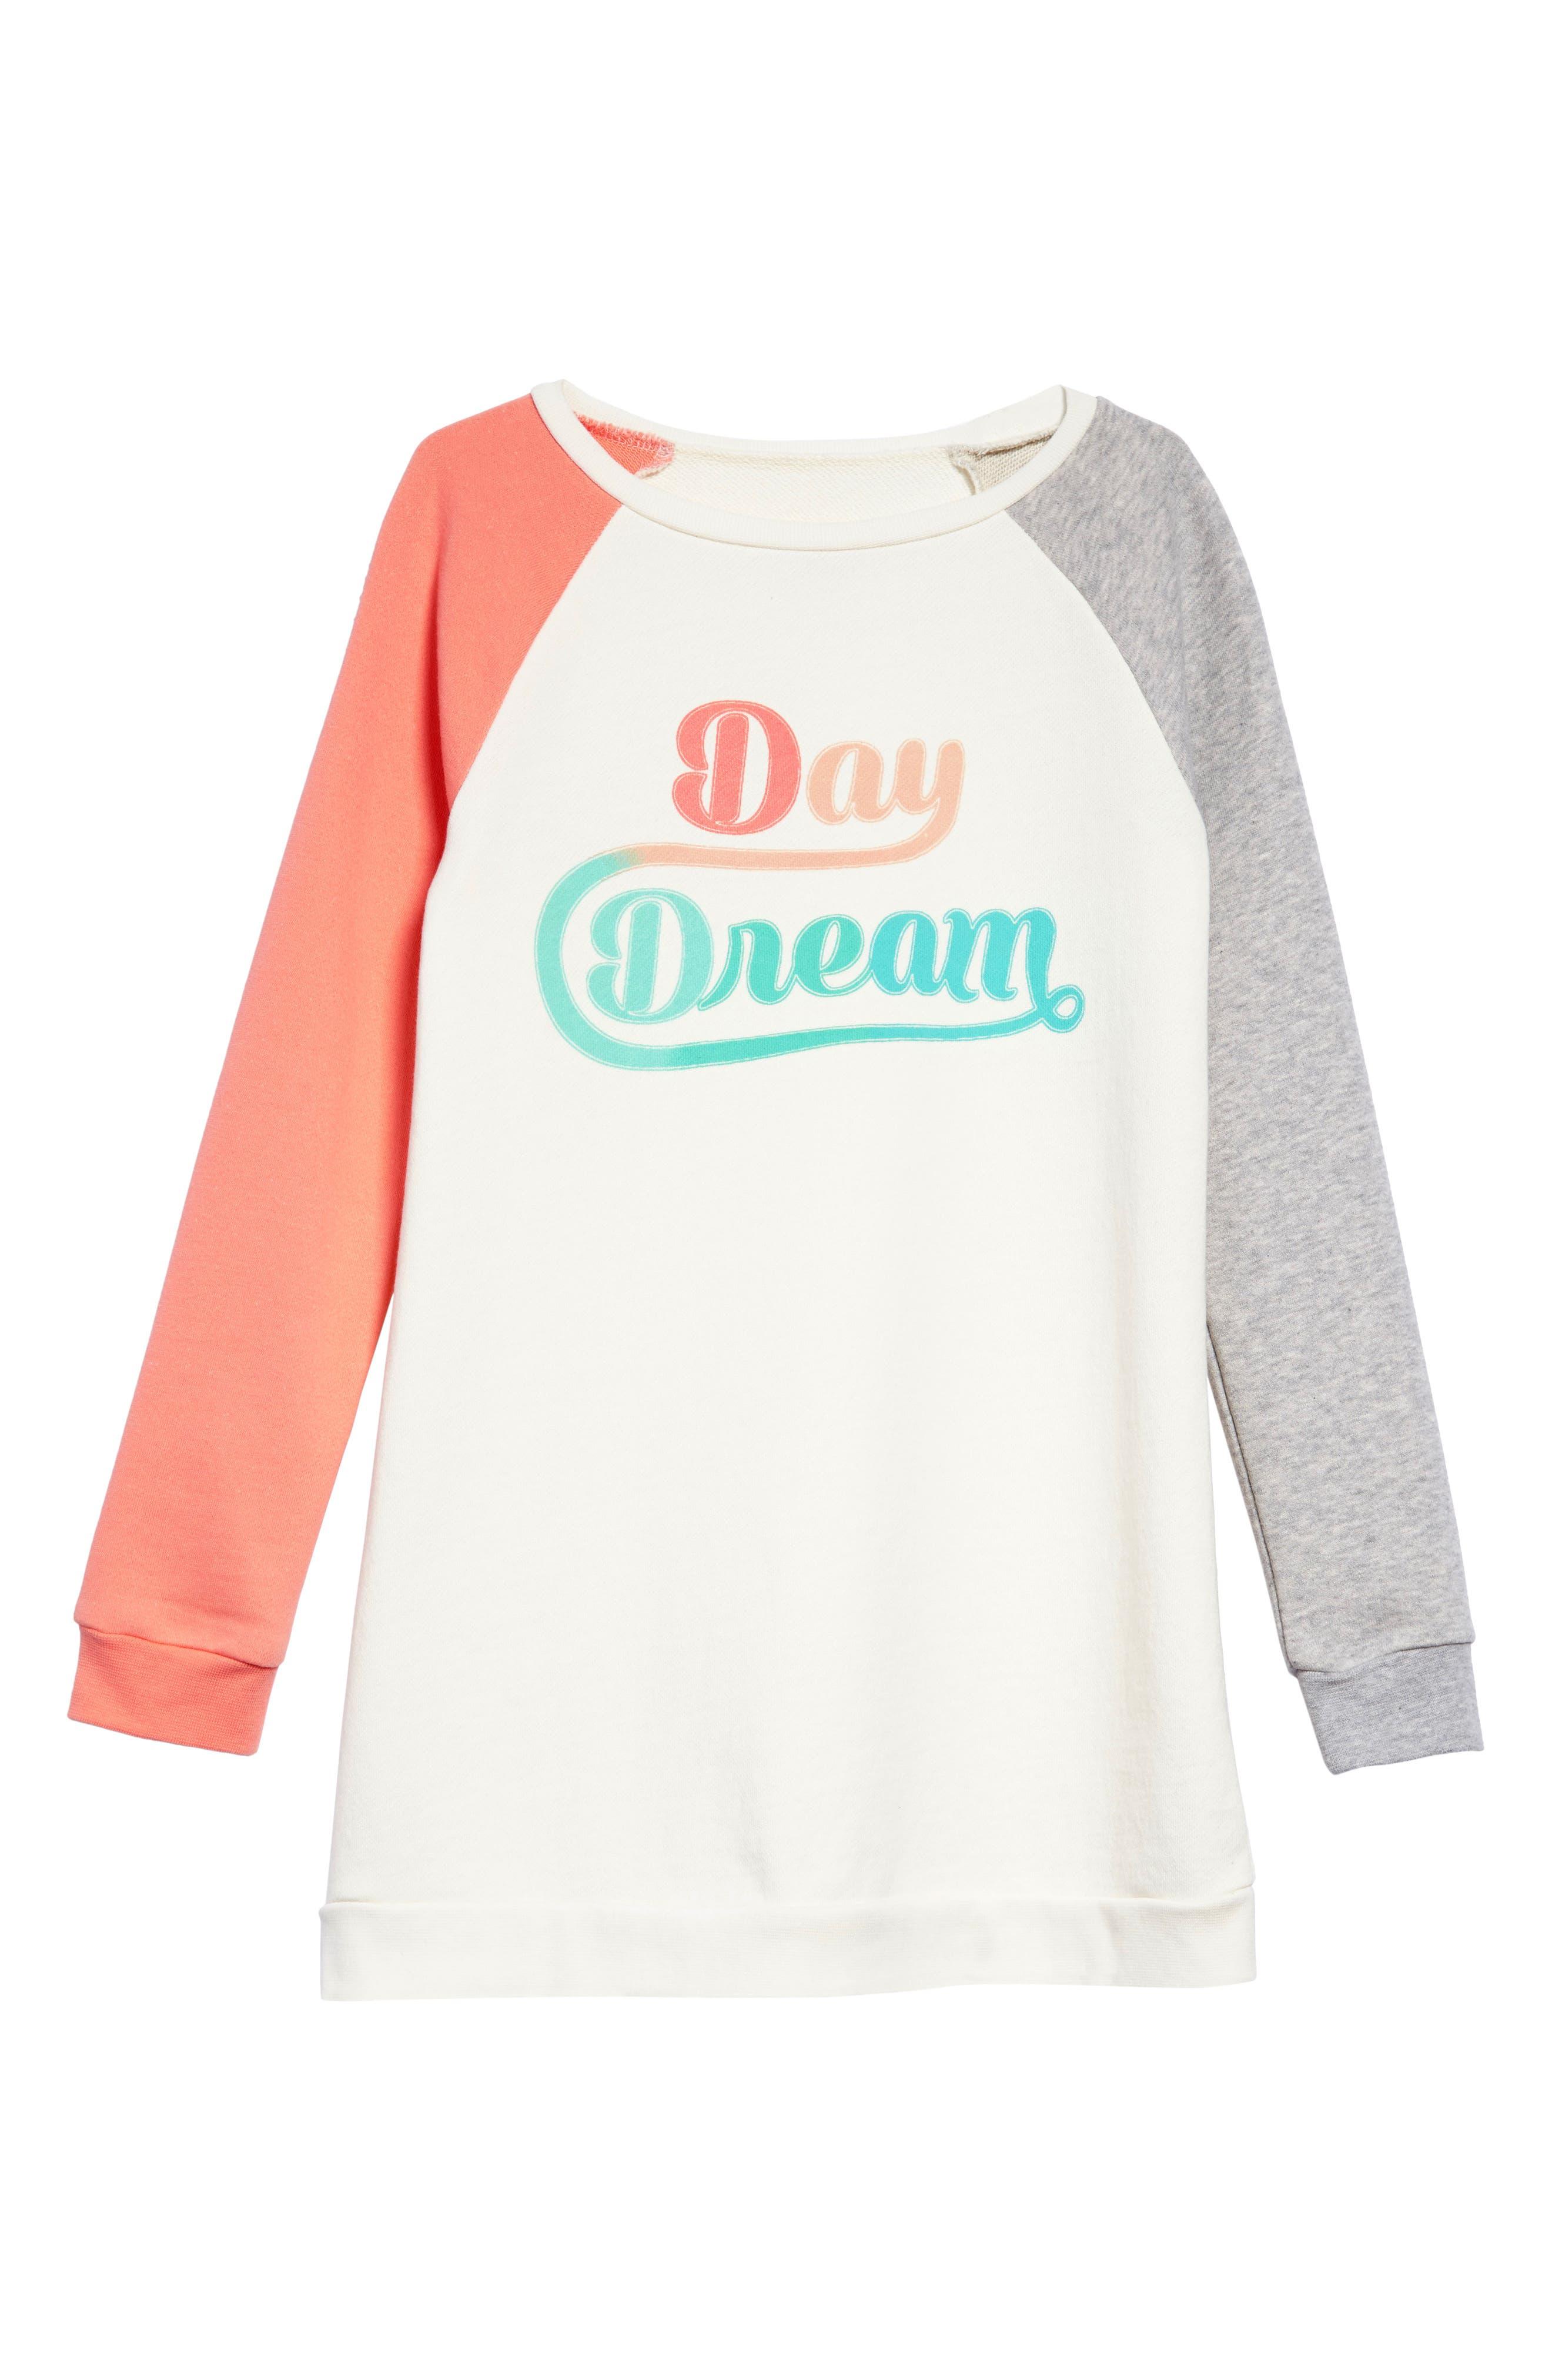 Sweatshirt Dress,                         Main,                         color, Ivory Egret Daydream